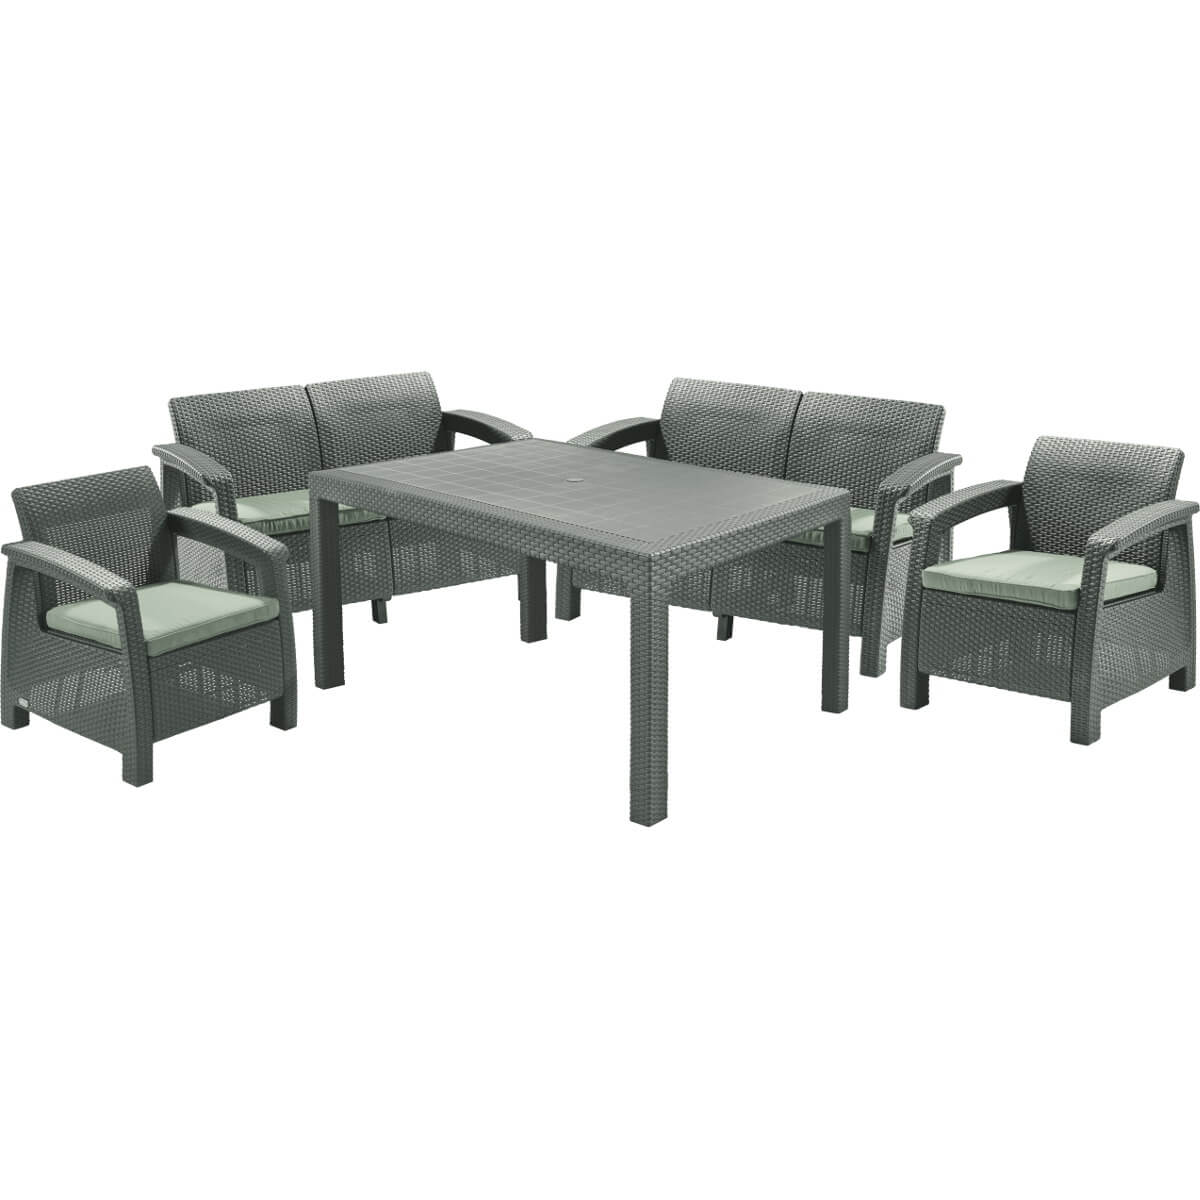 Комплект мебели Allibert Corfu Fiesta 17198008